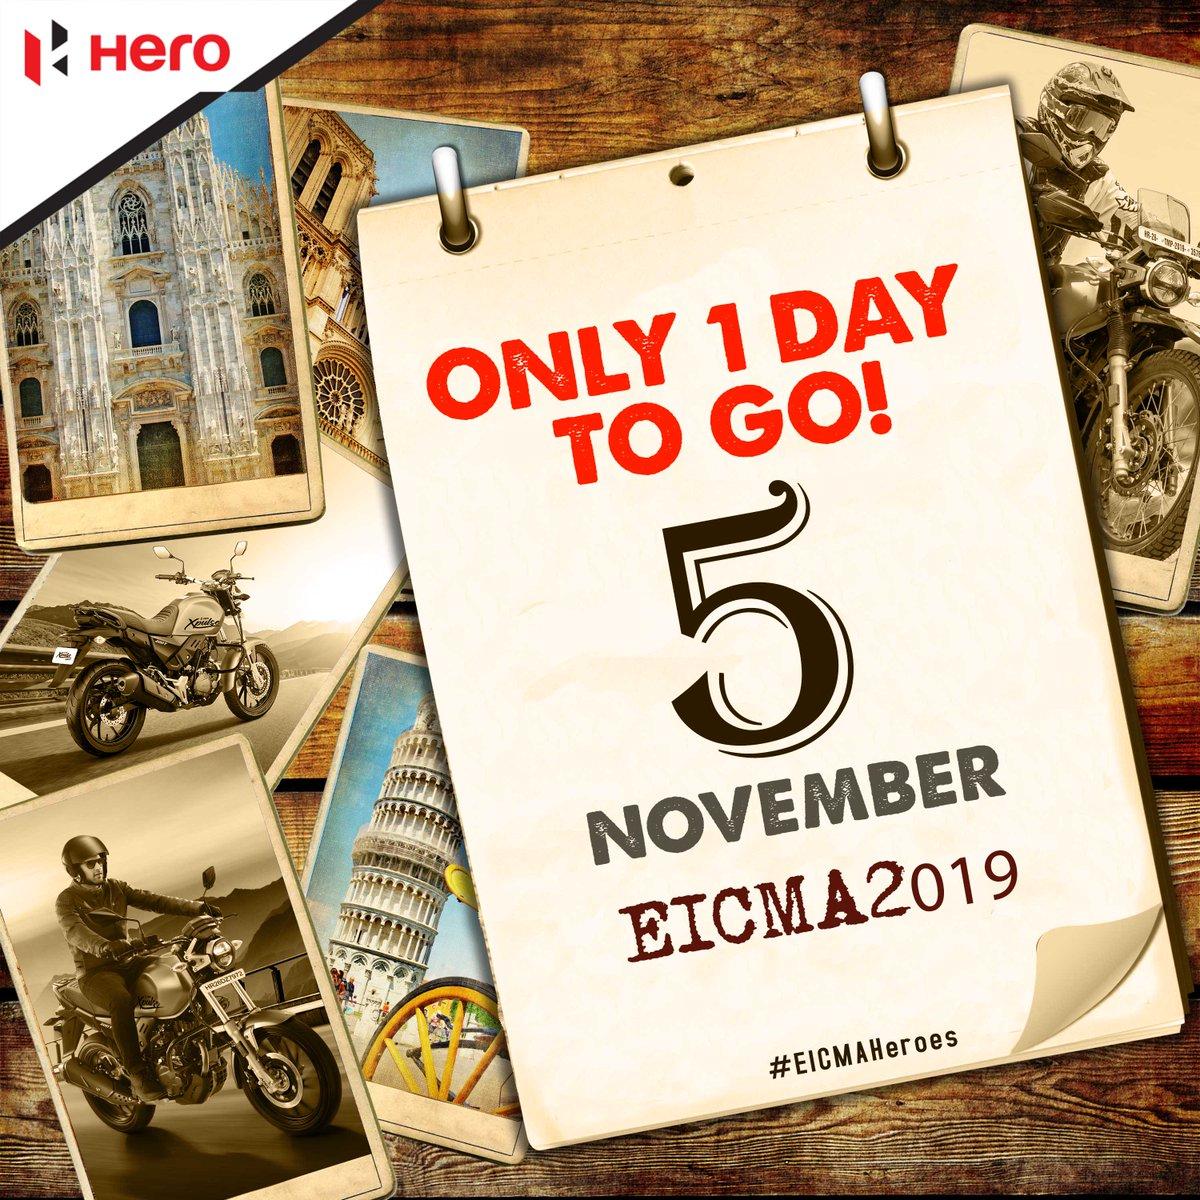 Only 1 day to go EICMA 2019 starts November 5. EICMAHEROES https t.co GdhMI3Ek35